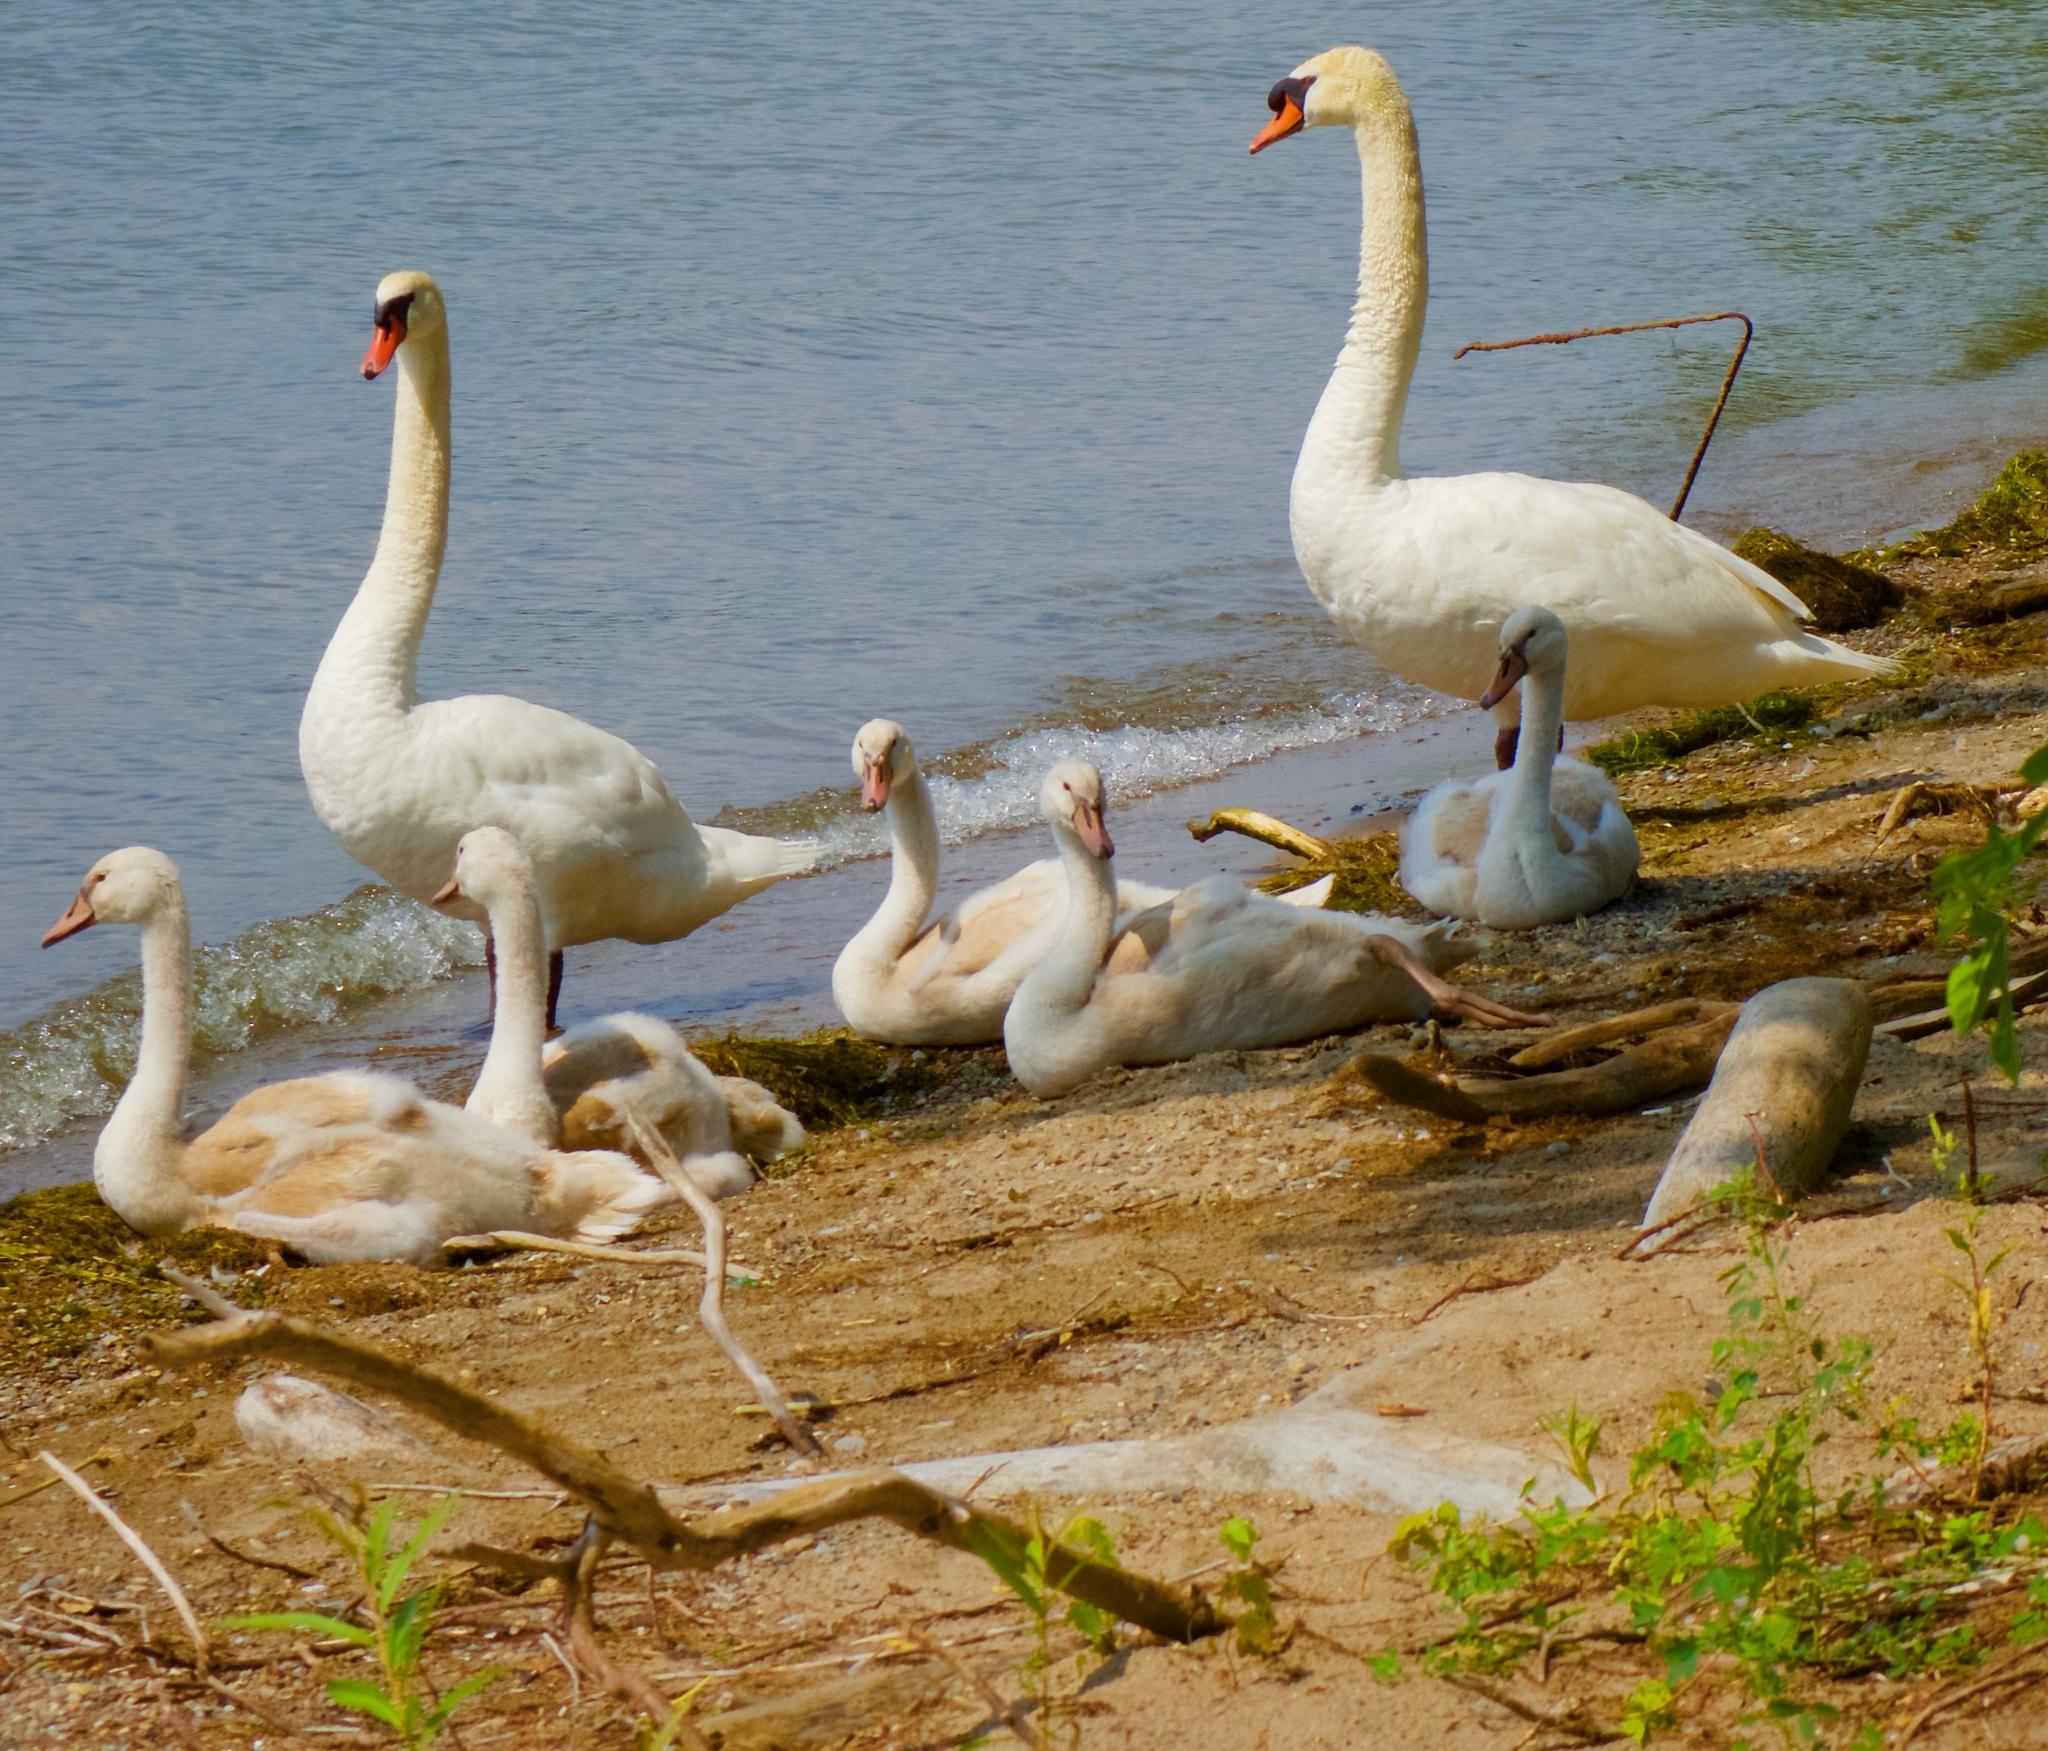 Goslings protected by Mom and Dad, Ward's Island by Karen Bekker